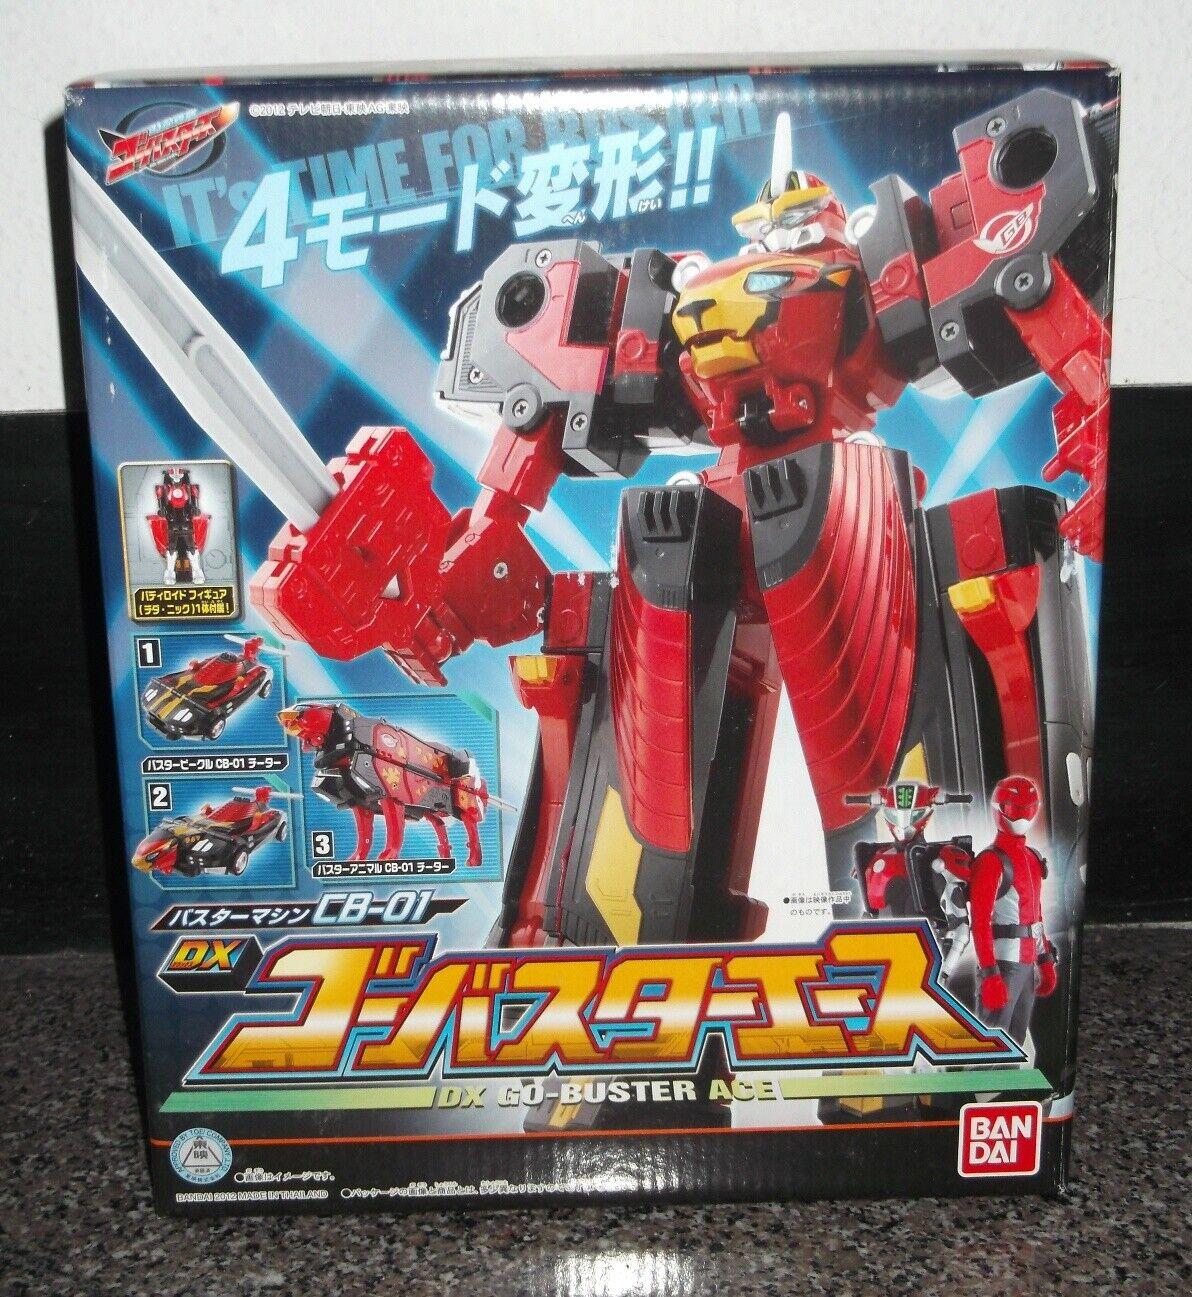 BeAI  DX GO-autoautobusTER ACE Go-autoautobusters Dx energia Rangers Megazord Sentai  vendita calda online